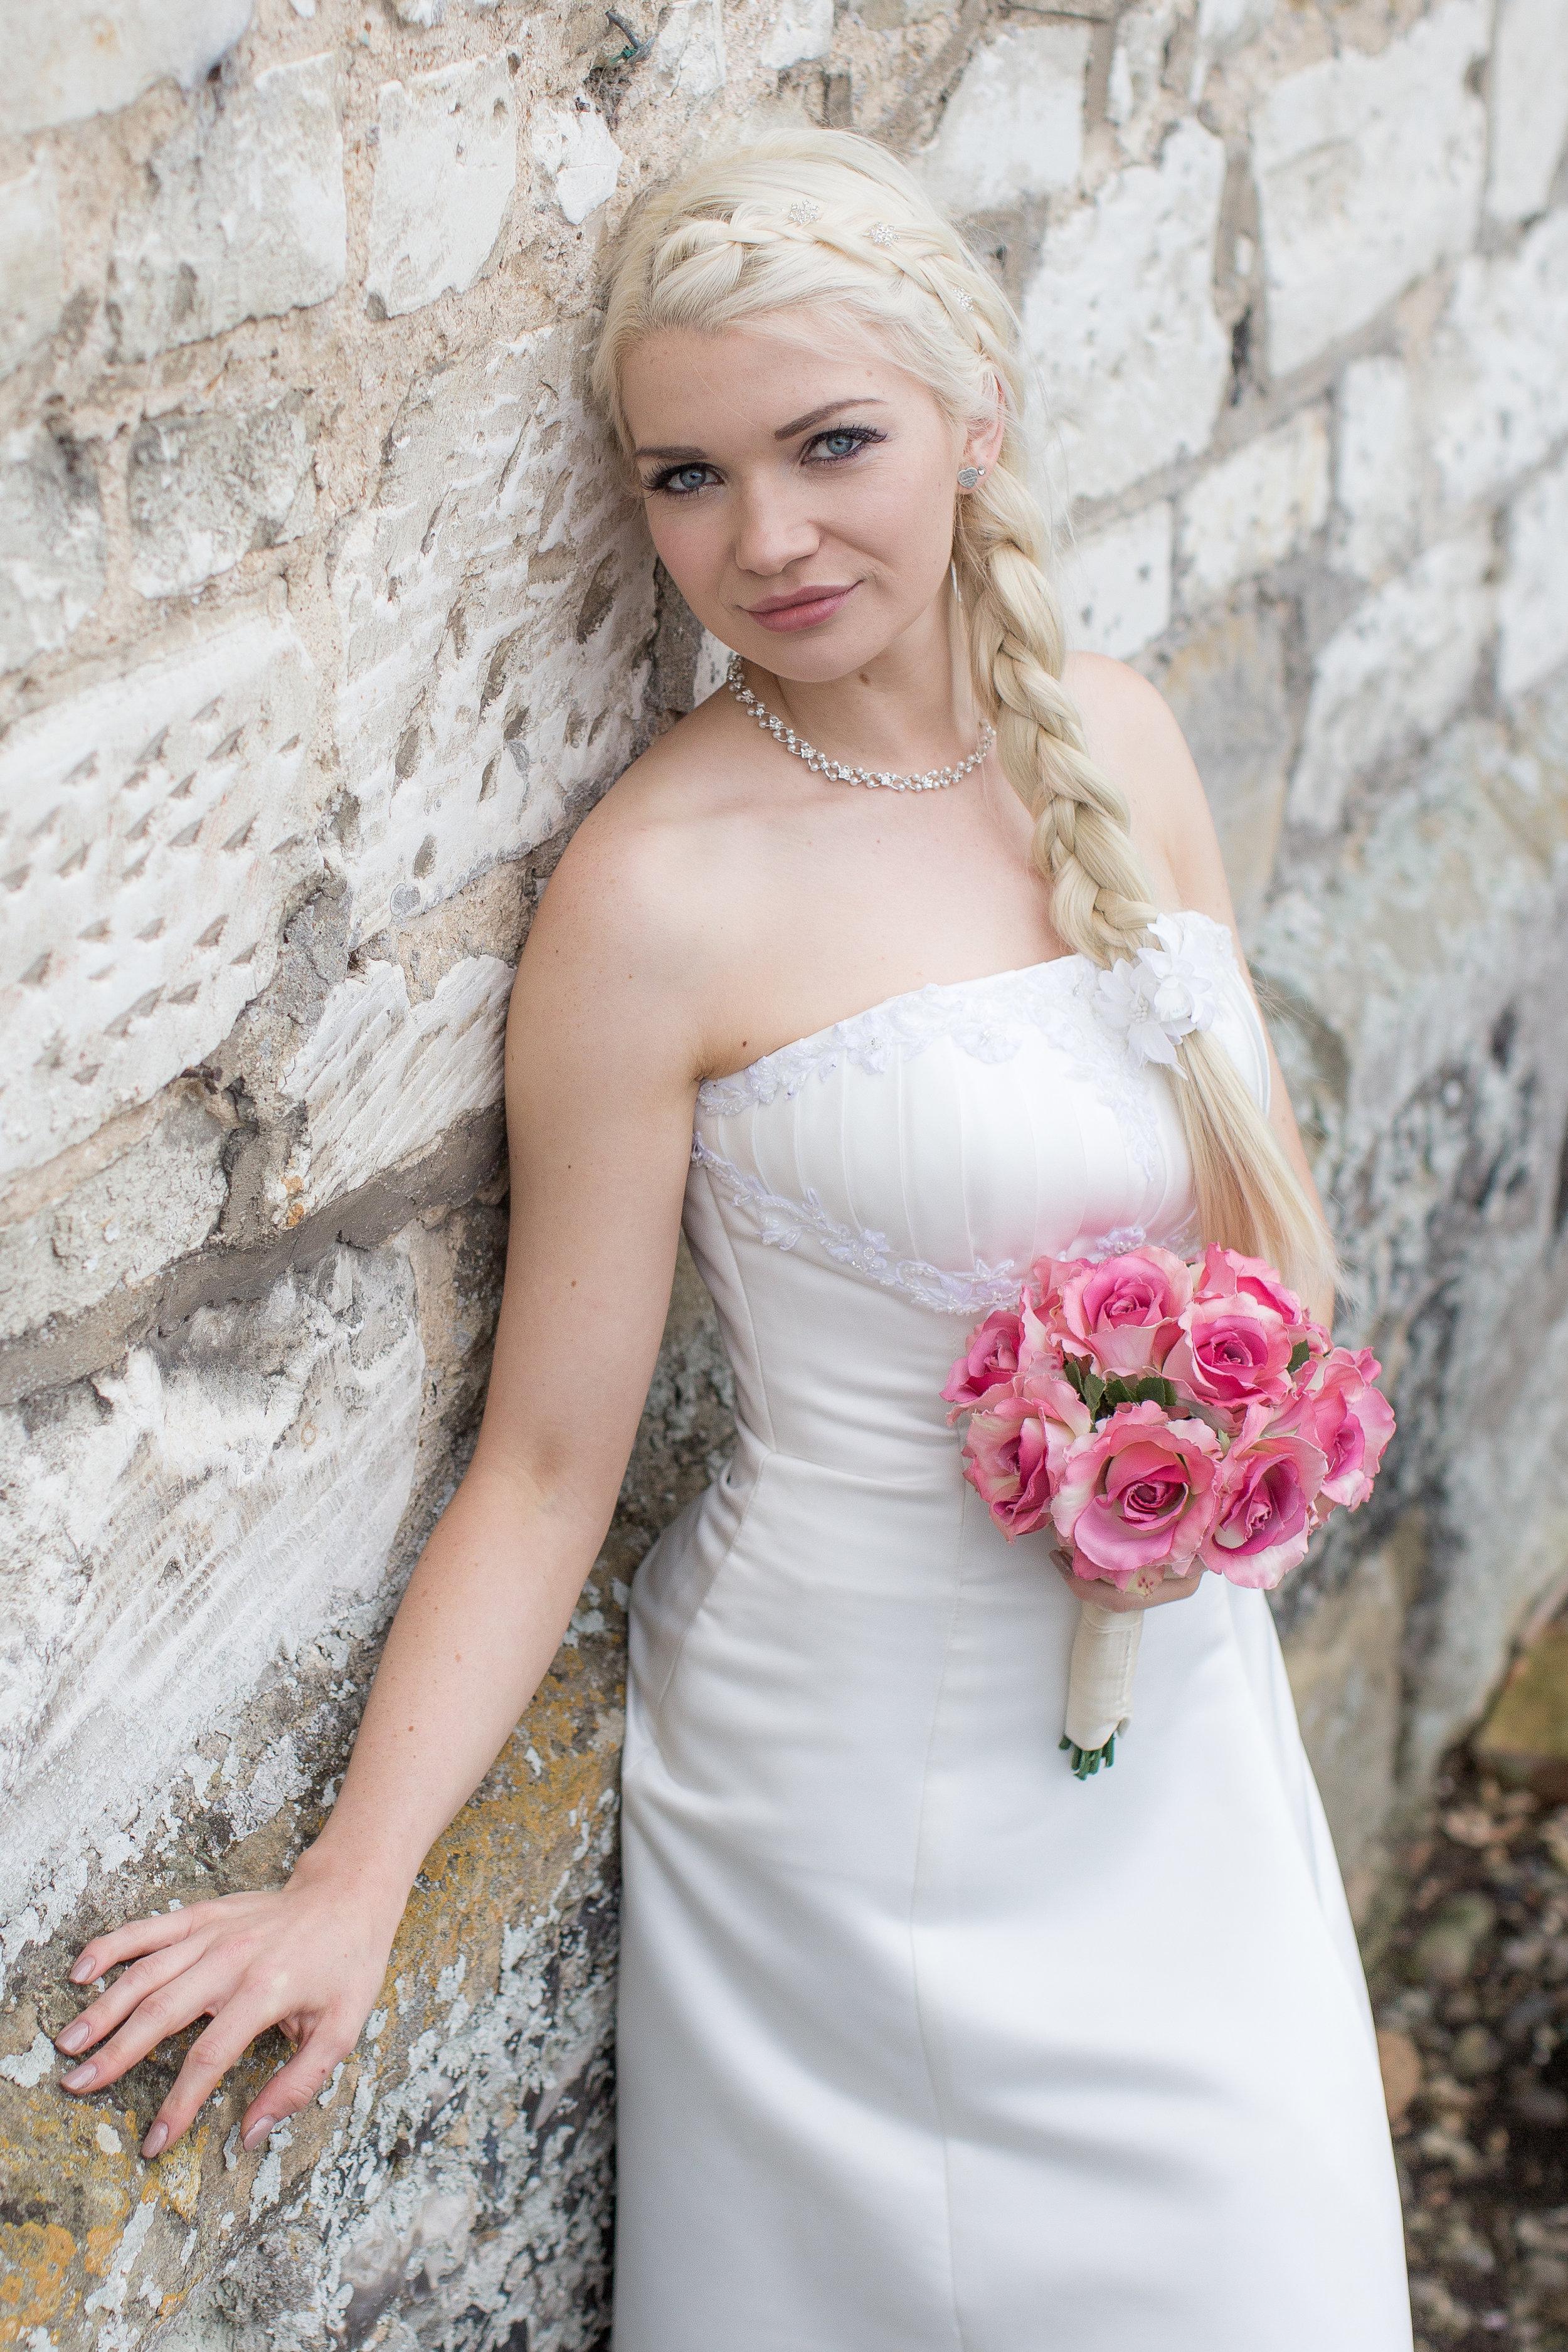 essex_wedding_photographer (2).jpg